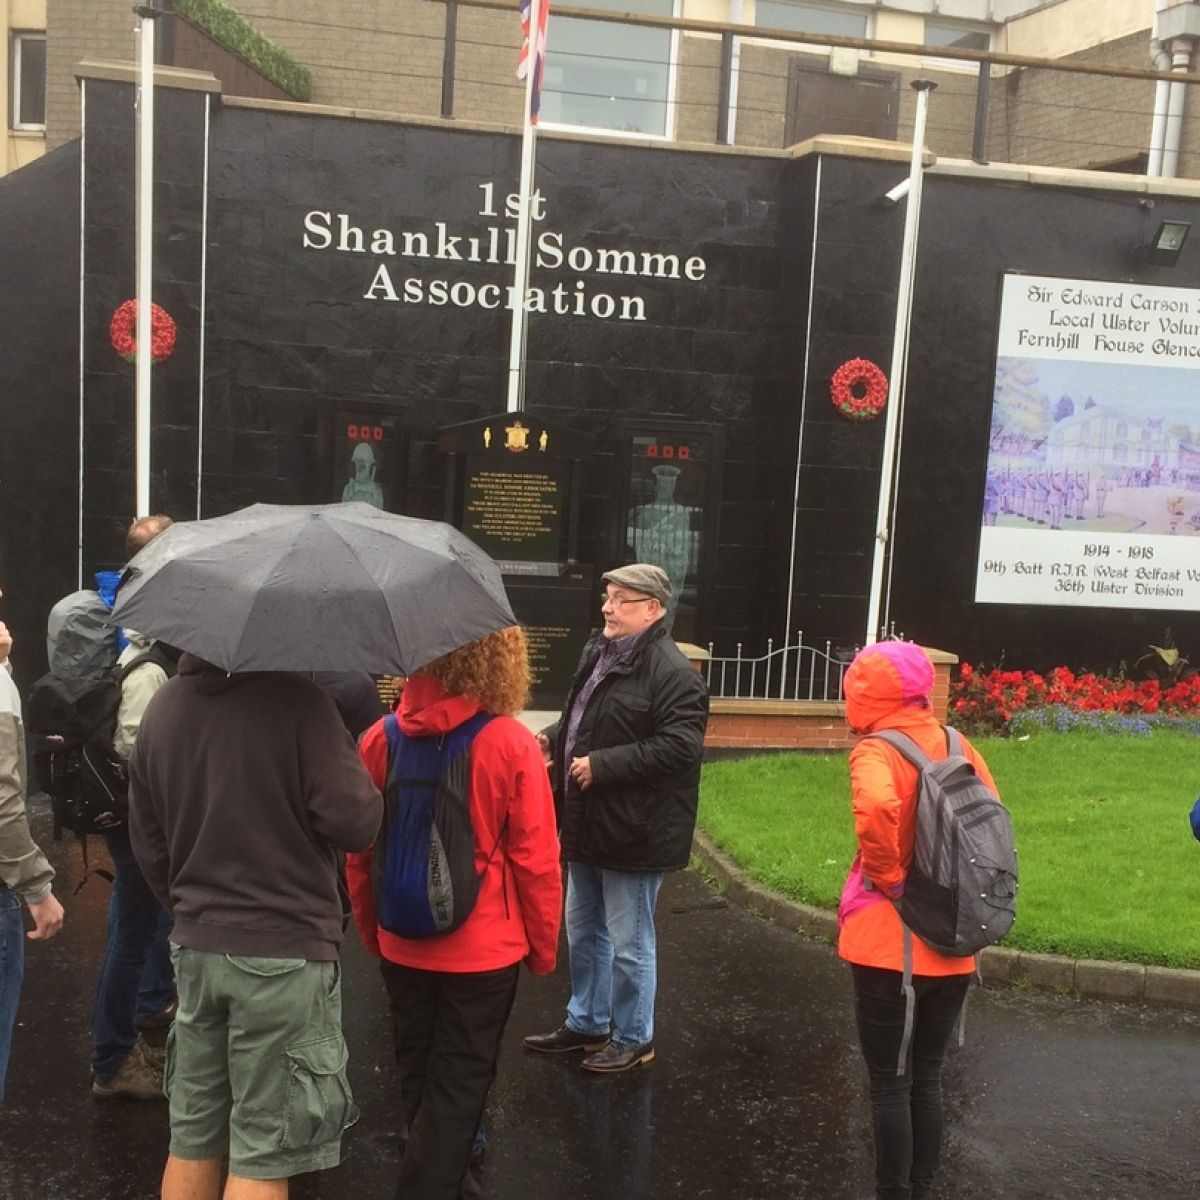 How? A Free Family Event in Shankill, Dublin - Family Fun